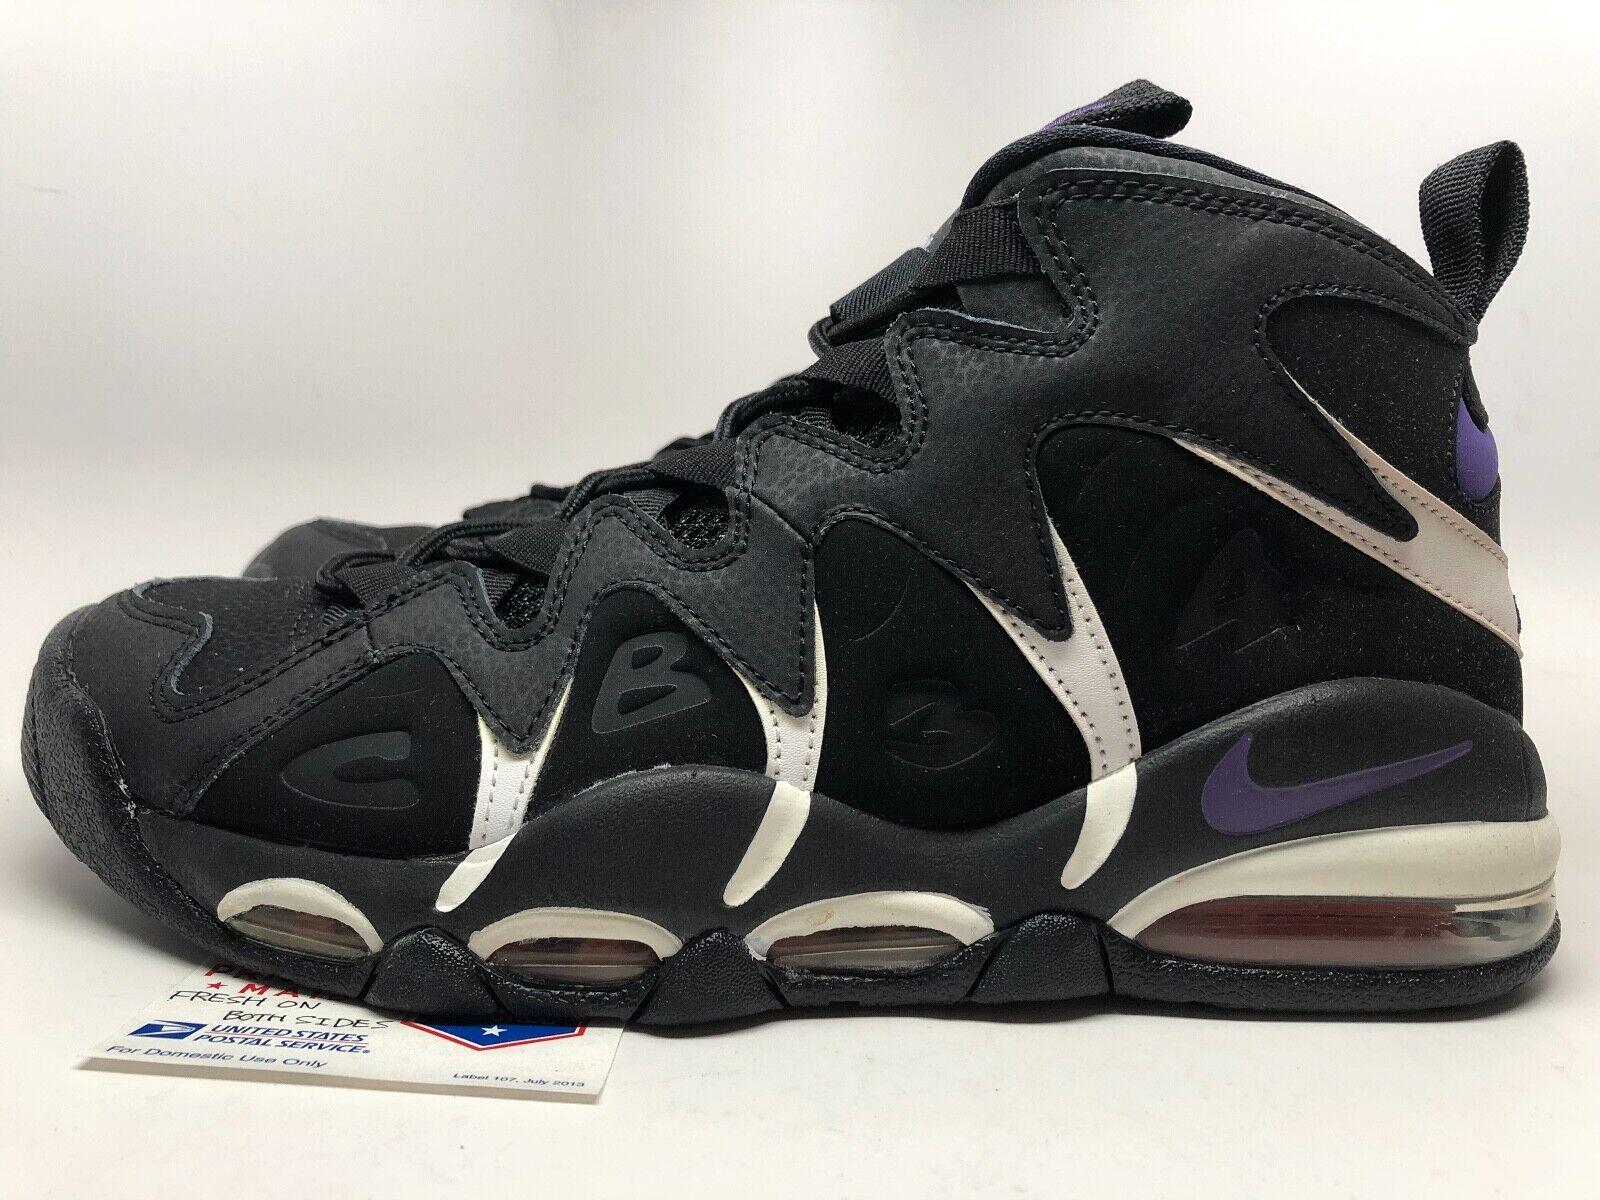 Nike Air Max CB34 Mens sz 8, 8.5, 10.5, 11 New